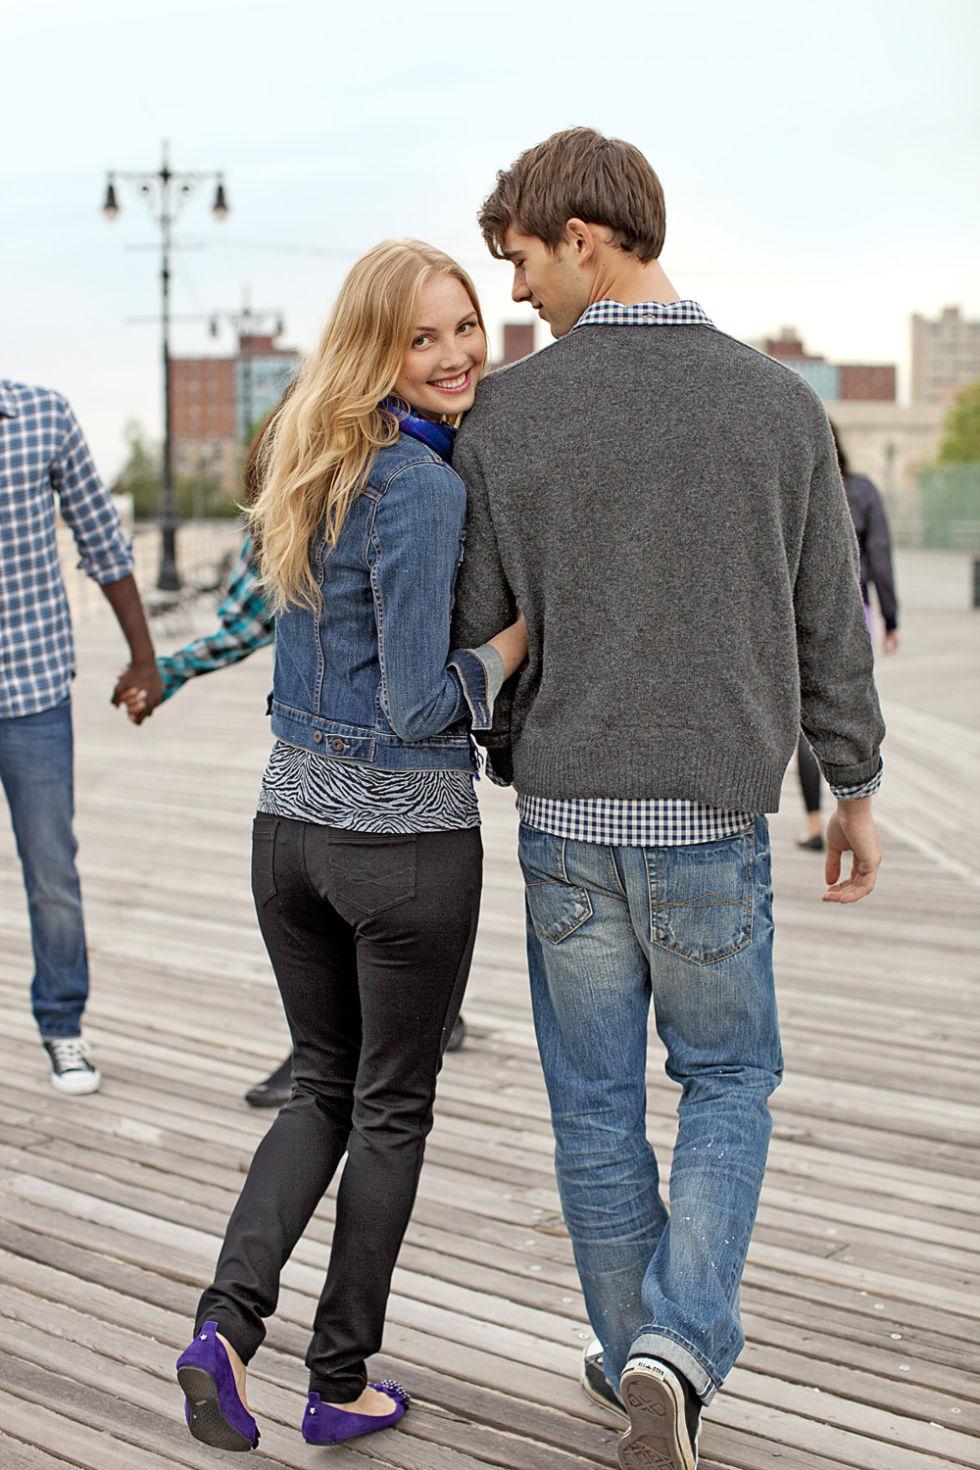 Fun Cheap Date Ideas for Teens   Dates For Teens On A Budget Seventeen